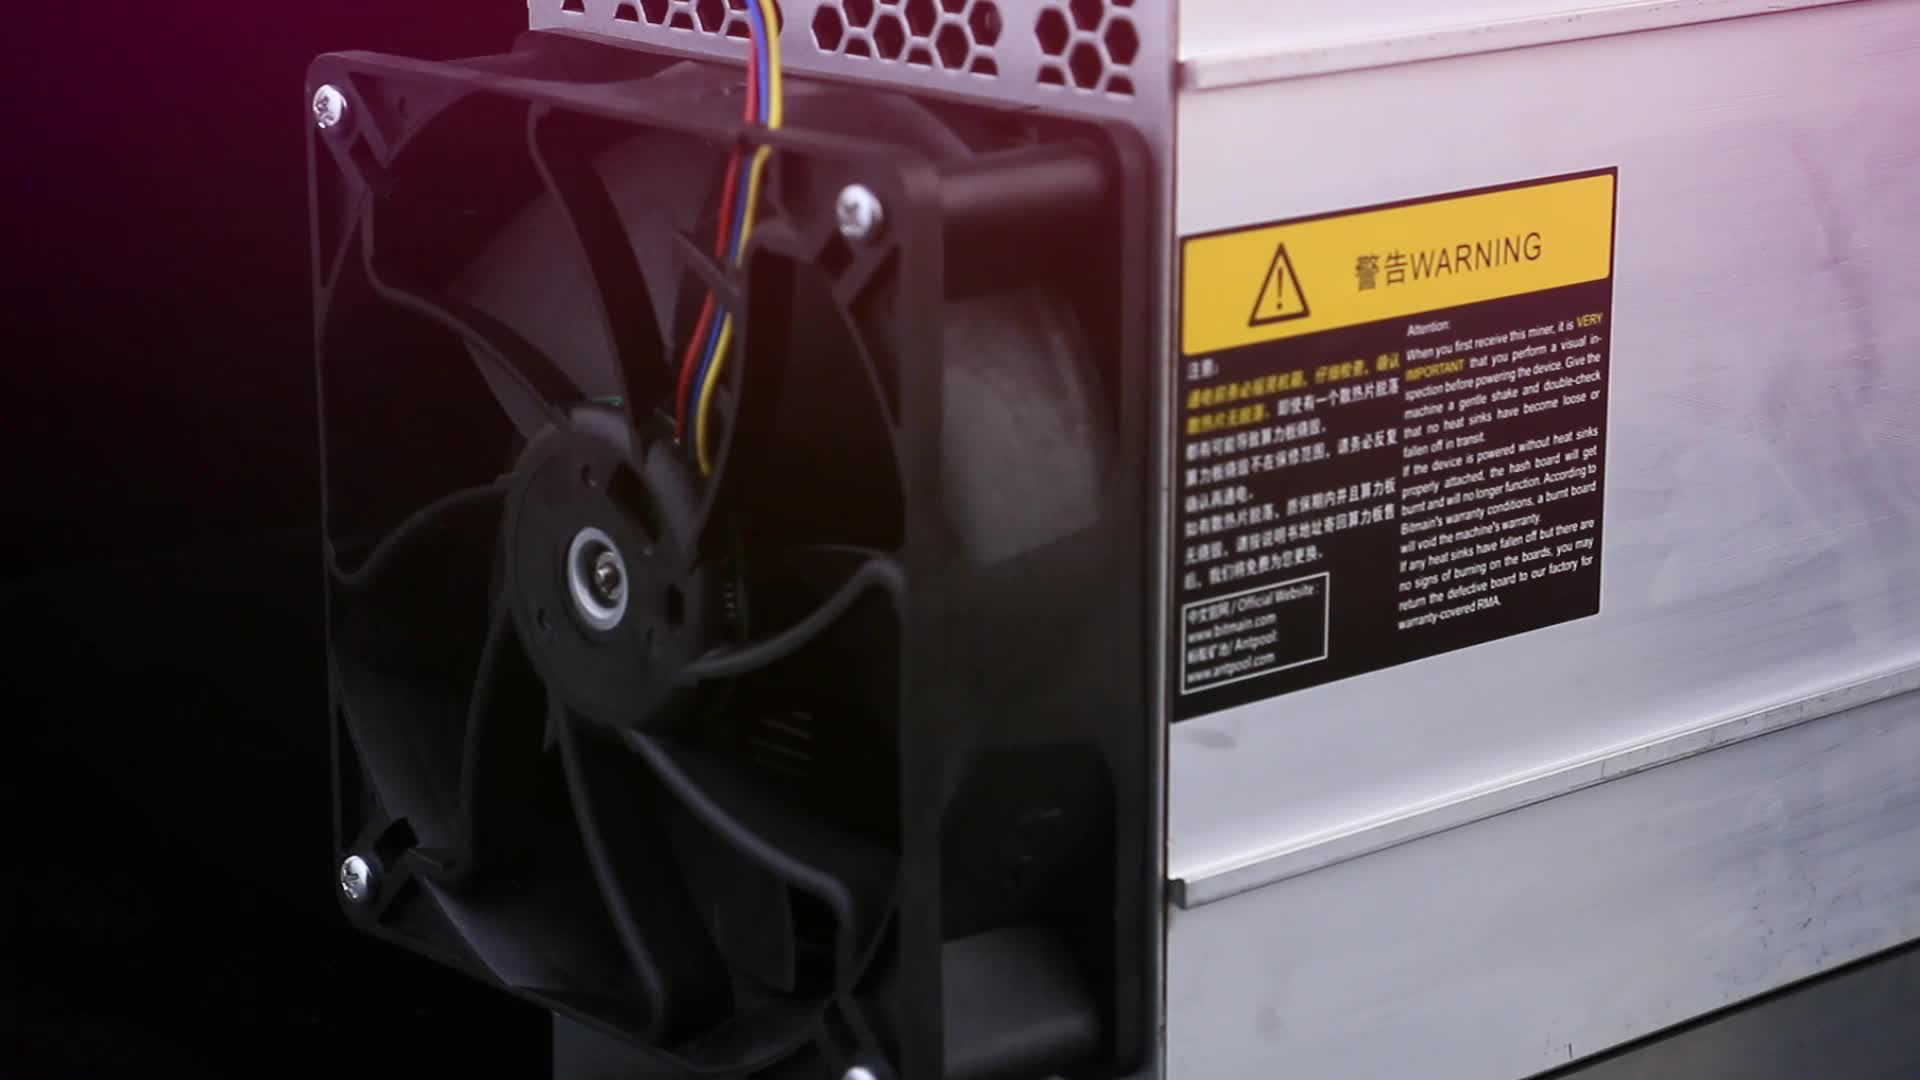 Trade assurance SHA-256 bitcoin asicminer T2T Miner Innosilicon T2 Turbo 24Th T3 43T